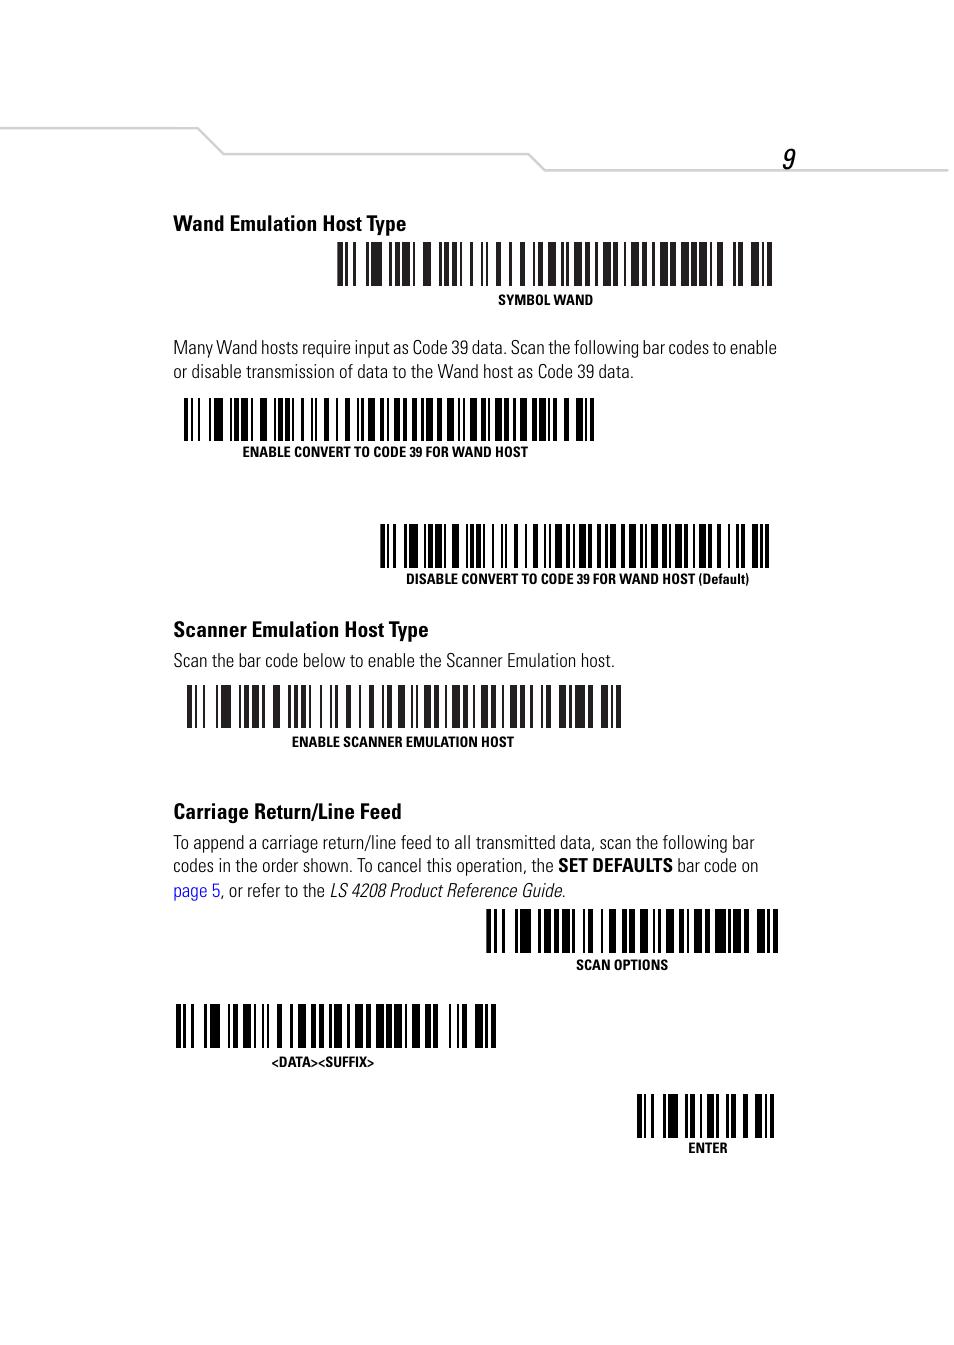 Wand Emulation Host Type Scanner Emulation Host Type Carriage